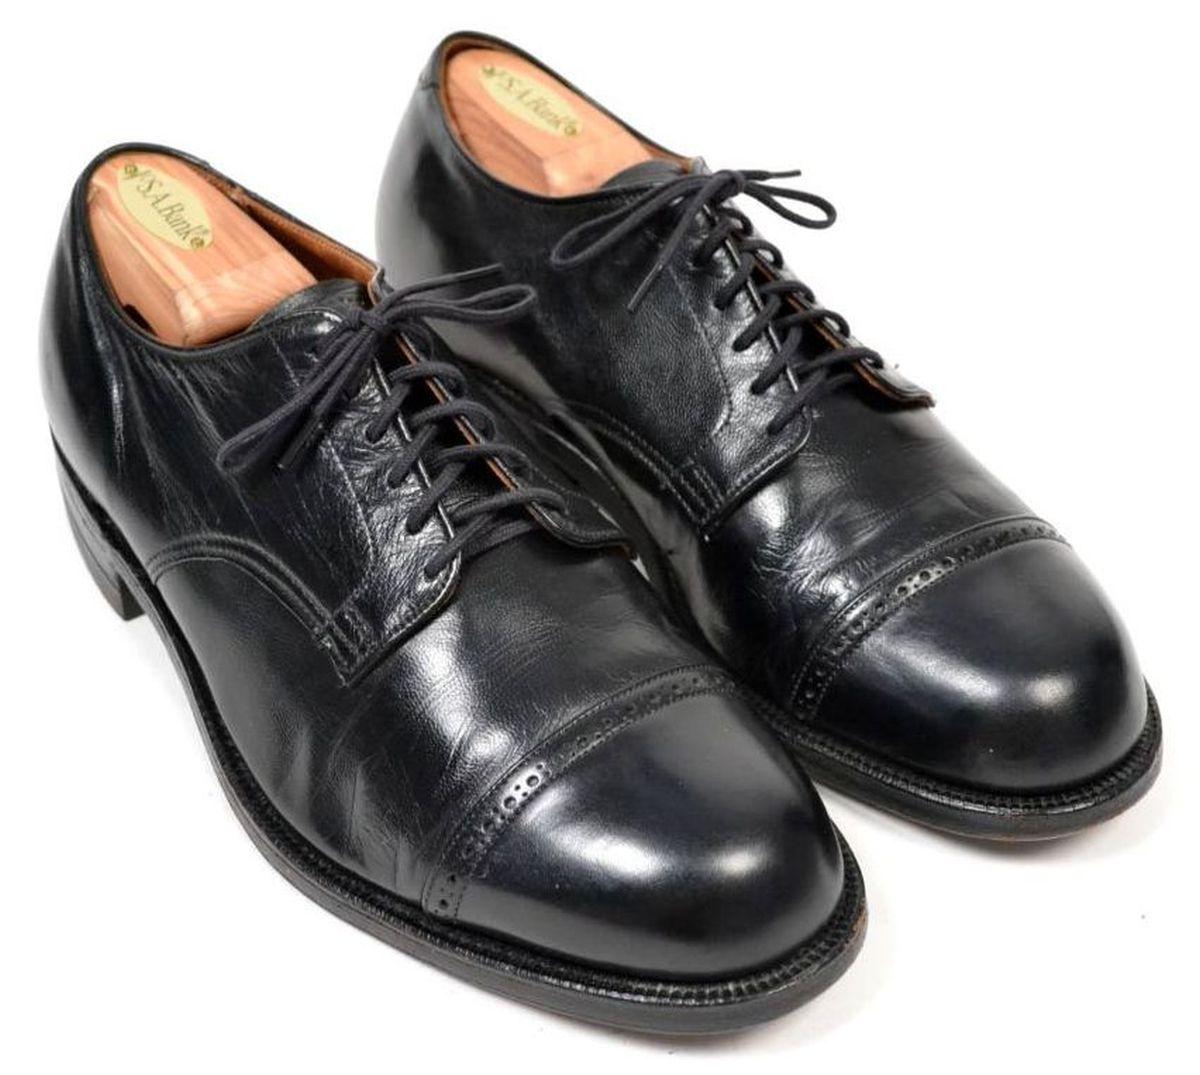 Mens Dress Shoes Size  Eeee